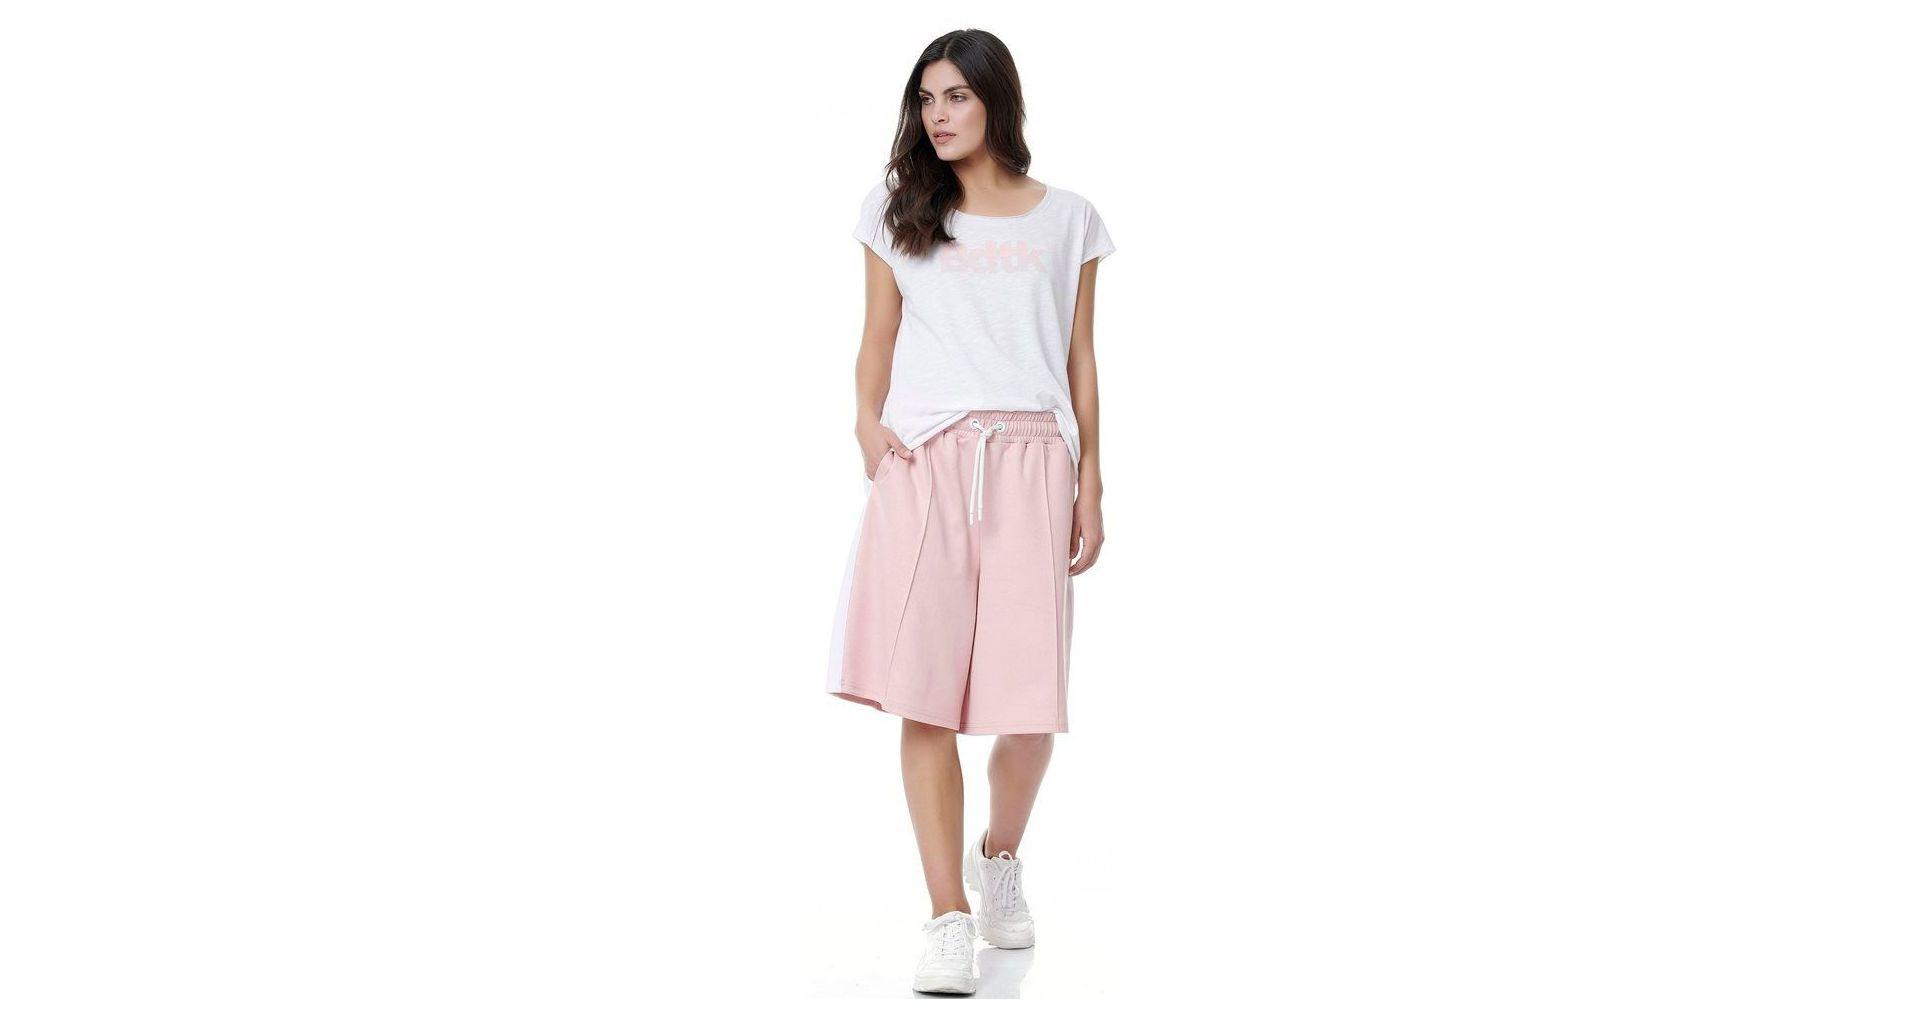 Women's short pants, casual, light, summery